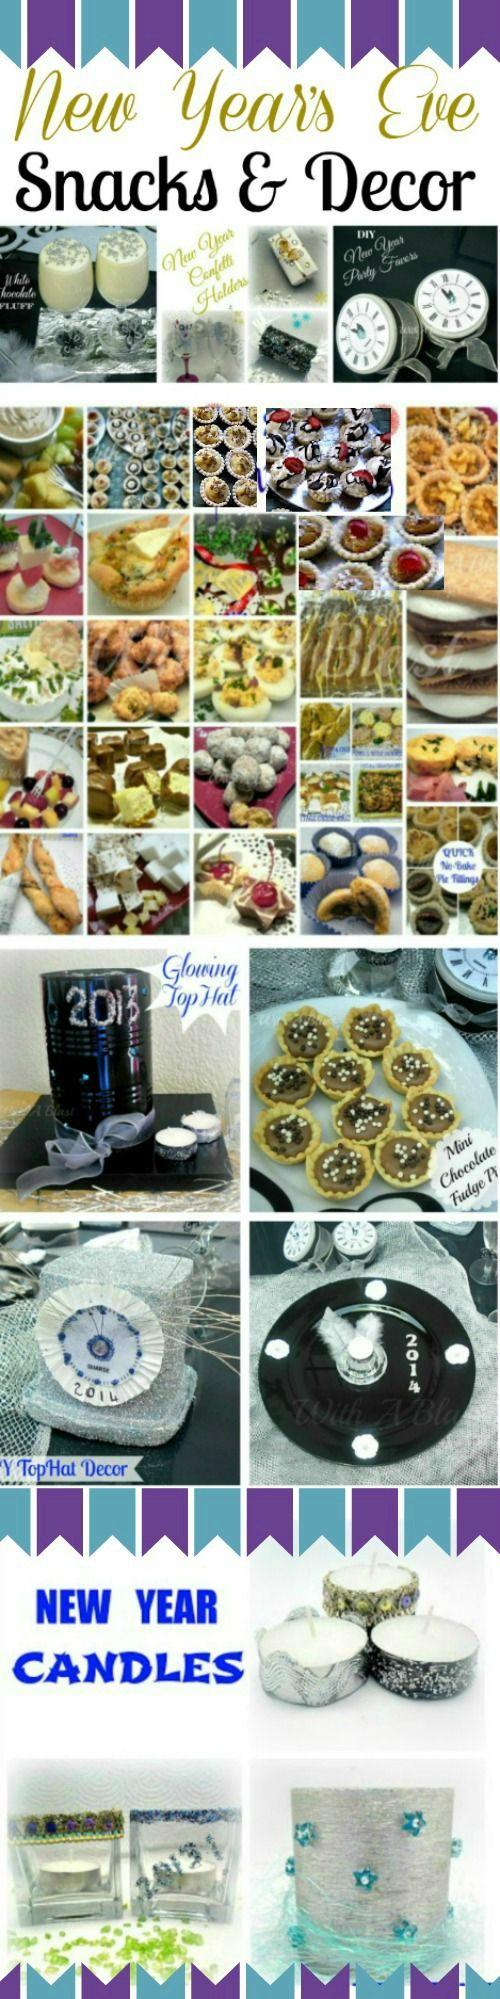 New Year's Eve Snacks & Decor